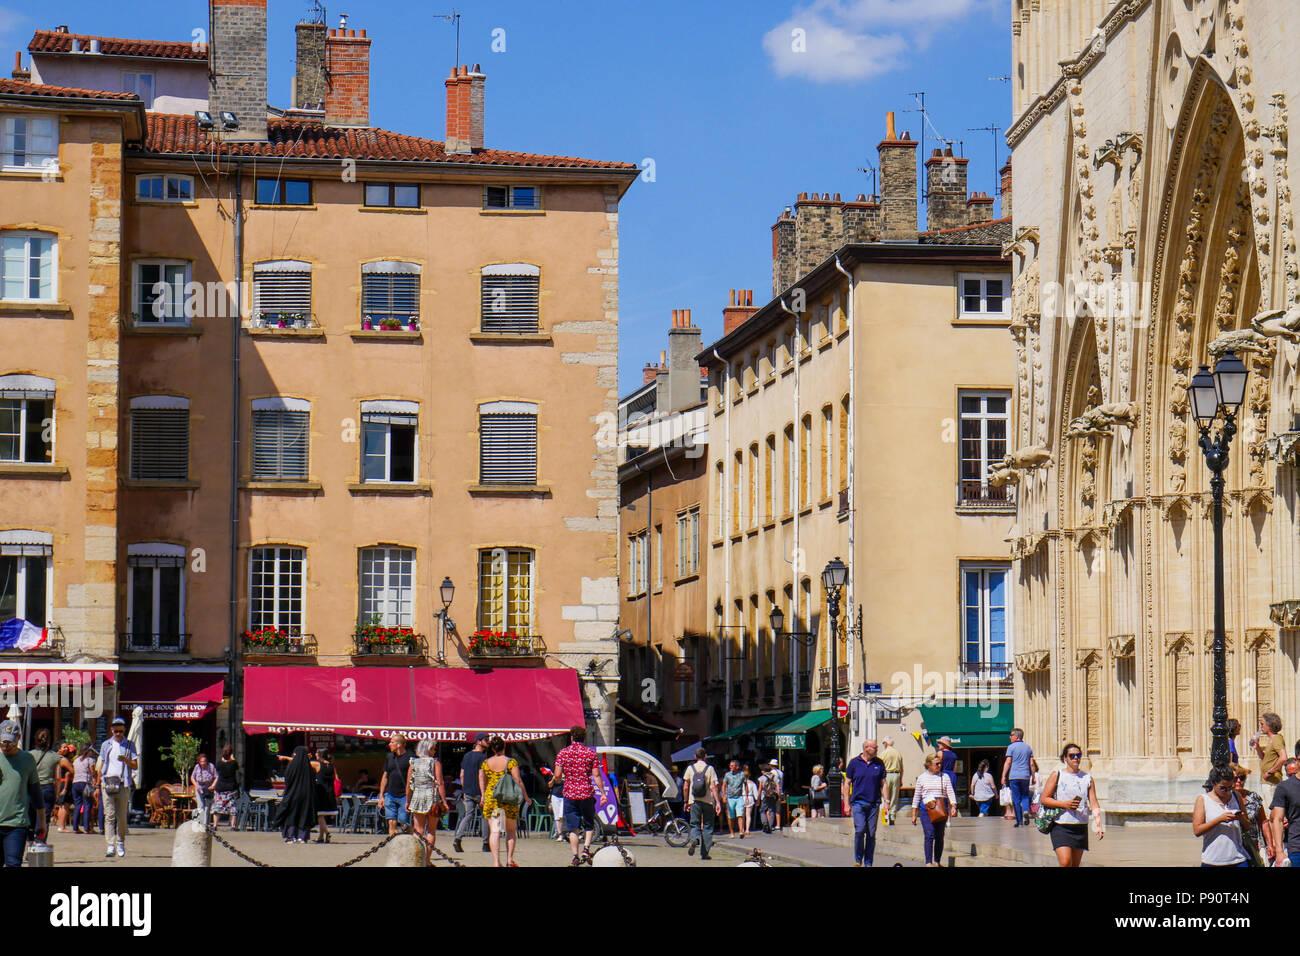 Saint-Jean square, Saint-Jean district, Lyon, France - Stock Image